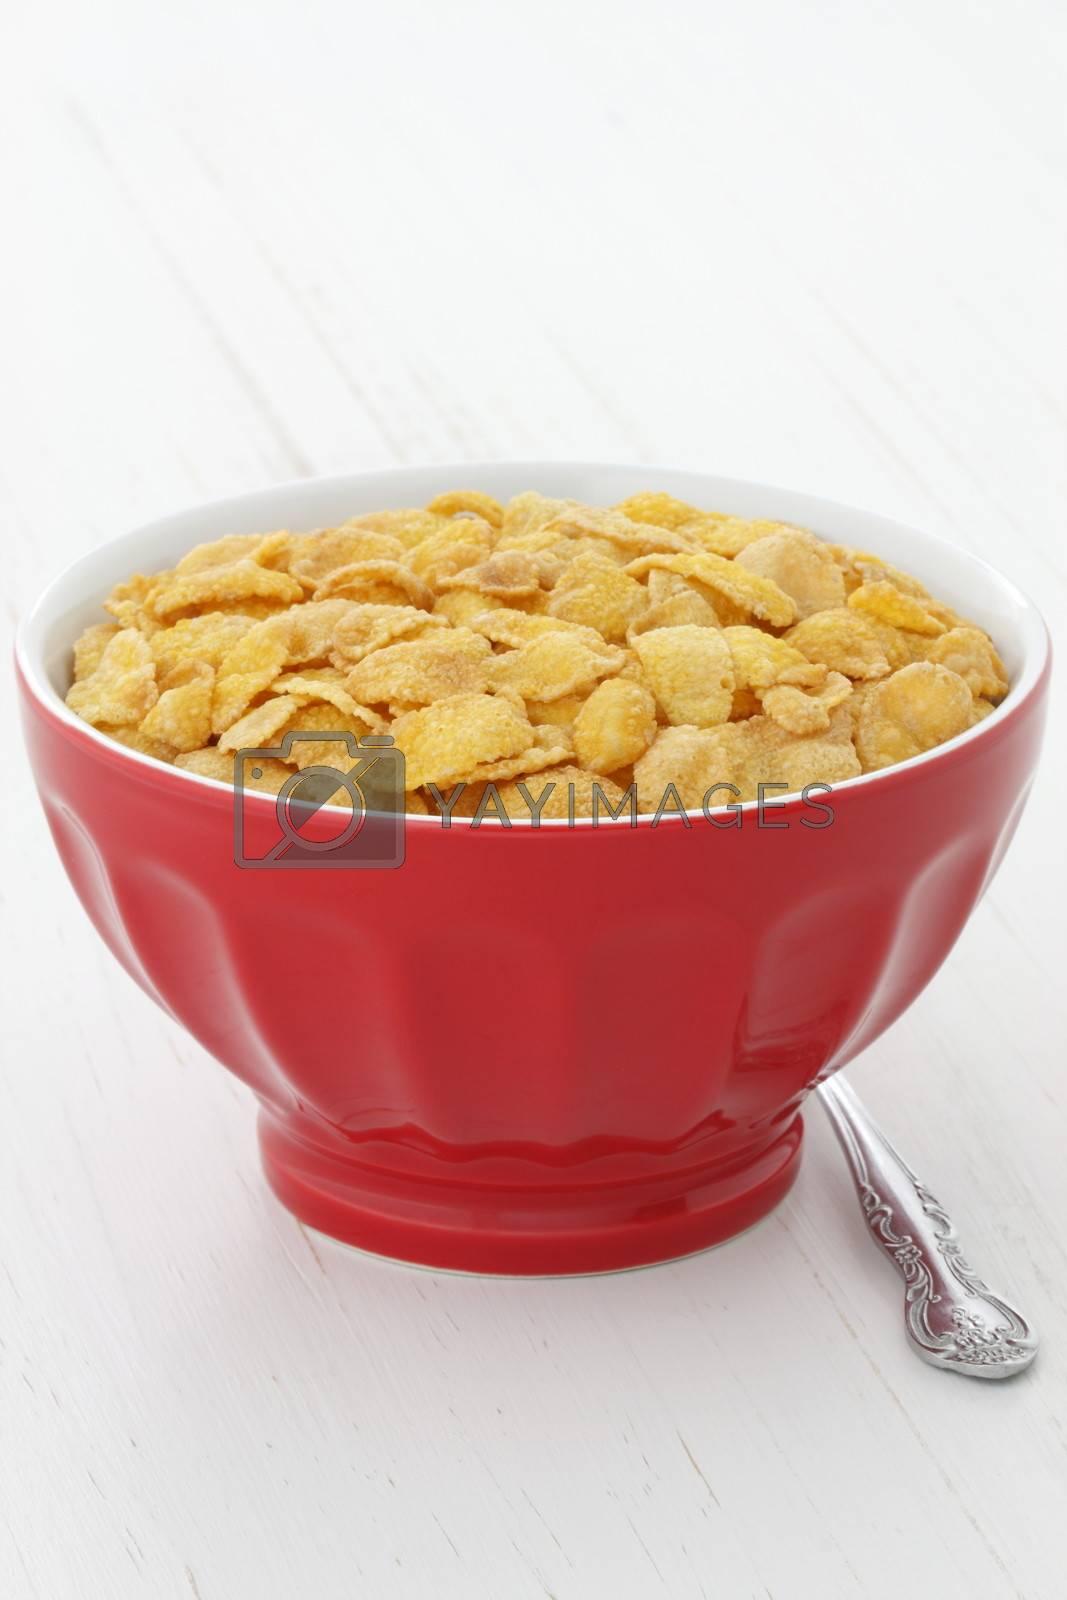 delicious and healthy wholegrain corn flakes breakfast.